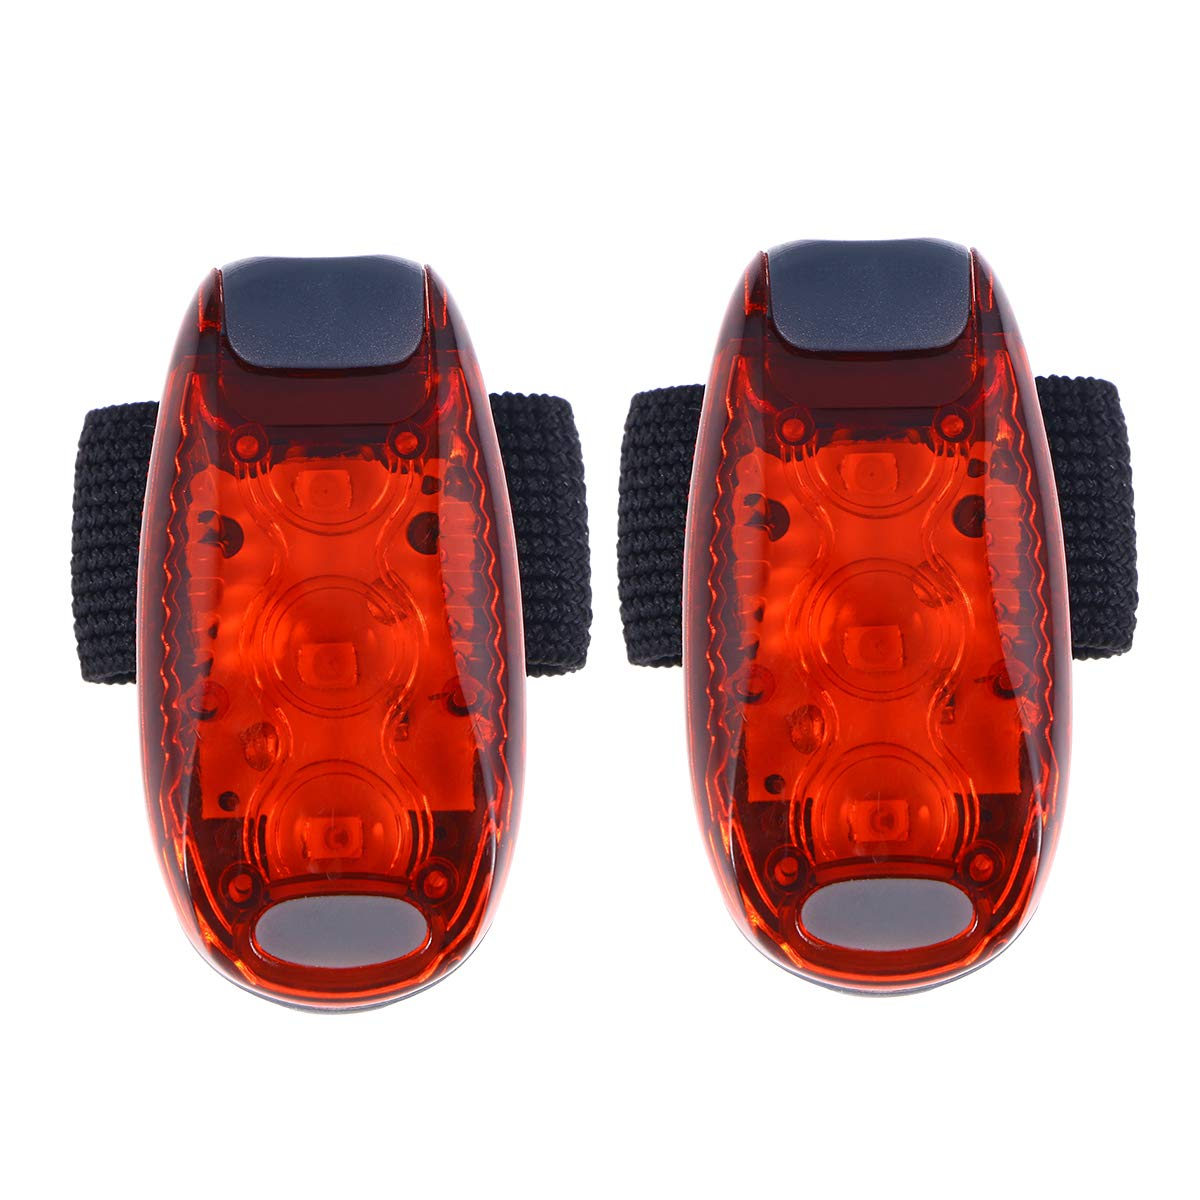 LIOOBO Luces estrobosc/ópicas de luz led de Seguridad para Correr Correr. Correr